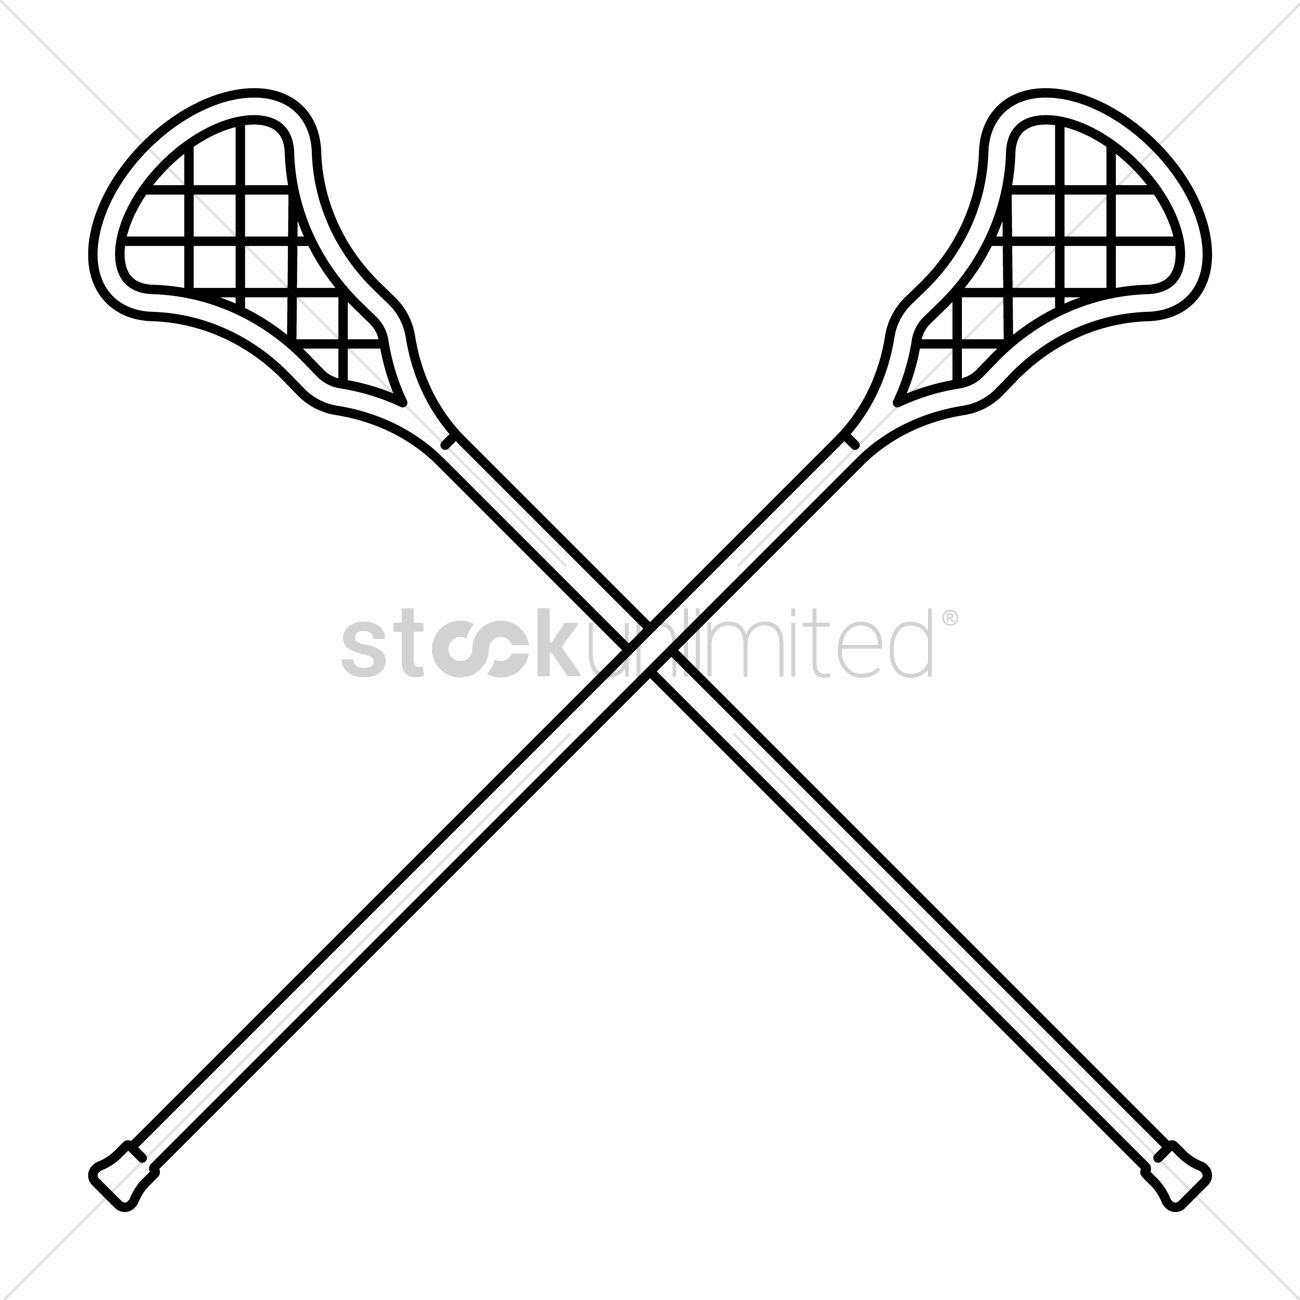 Crossed Lacrosse Stick Vector Image